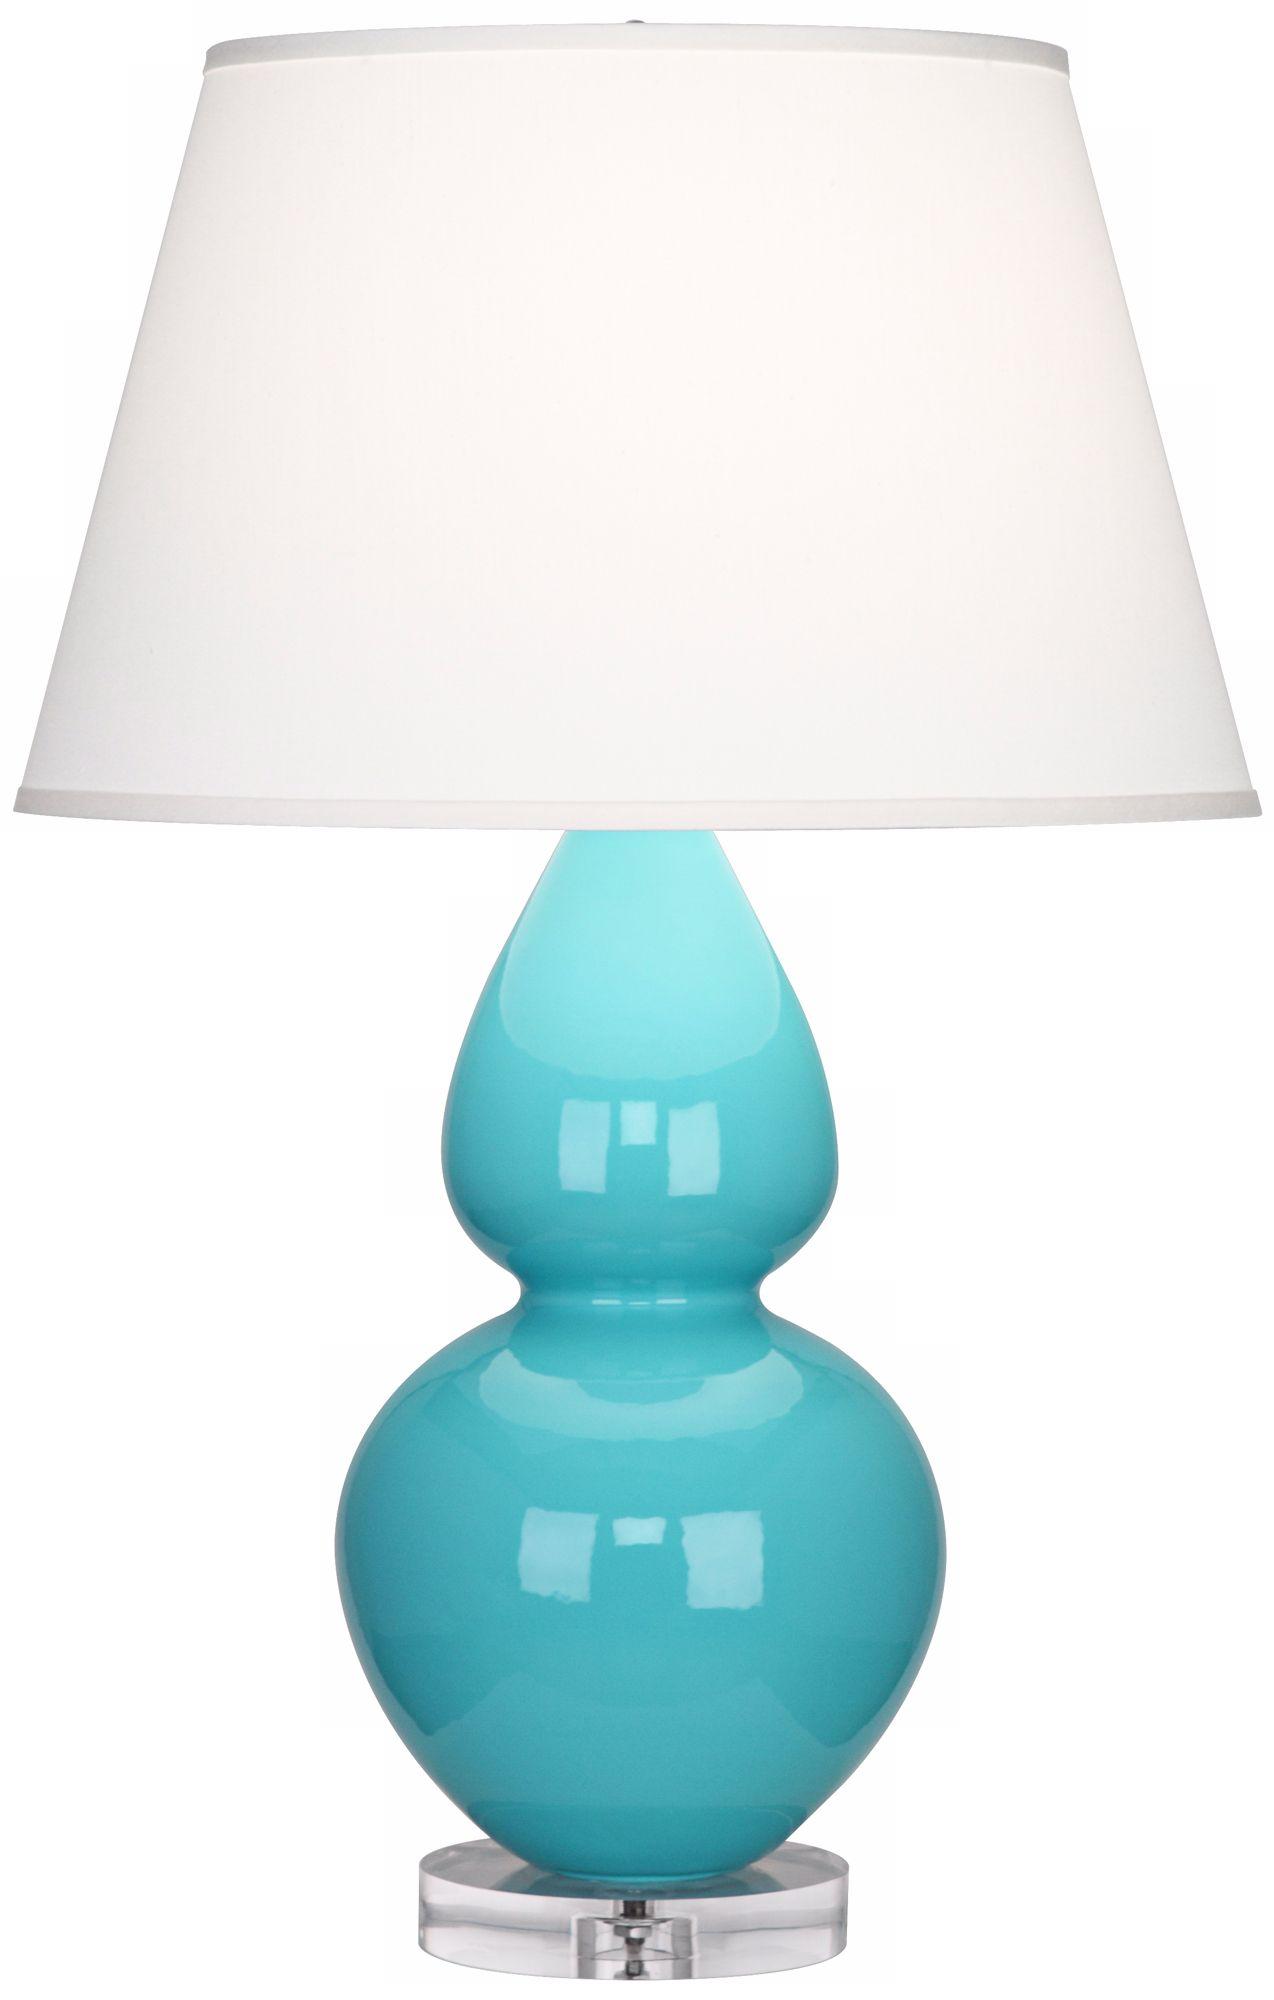 Superb Robert Abbey Double Gourd Egg Blue Ceramic Table Lamp